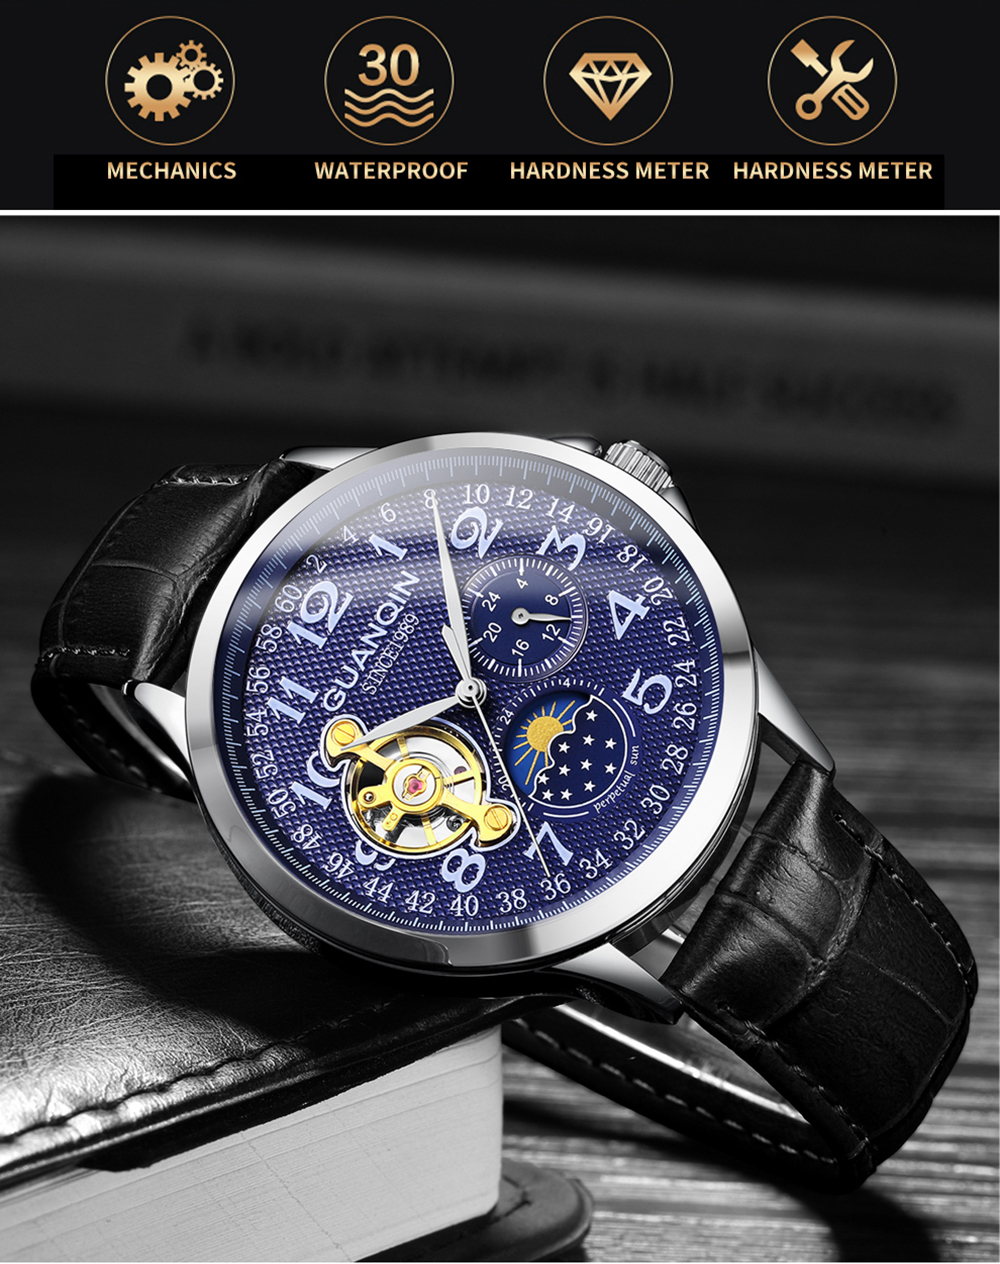 HTB1trj2XUGF3KVjSZFvq6z nXXaZ GUANQIN mechanical watch men waterproof automatic skeleton tourbillon clock men business top brand luxury Relogio Masculino